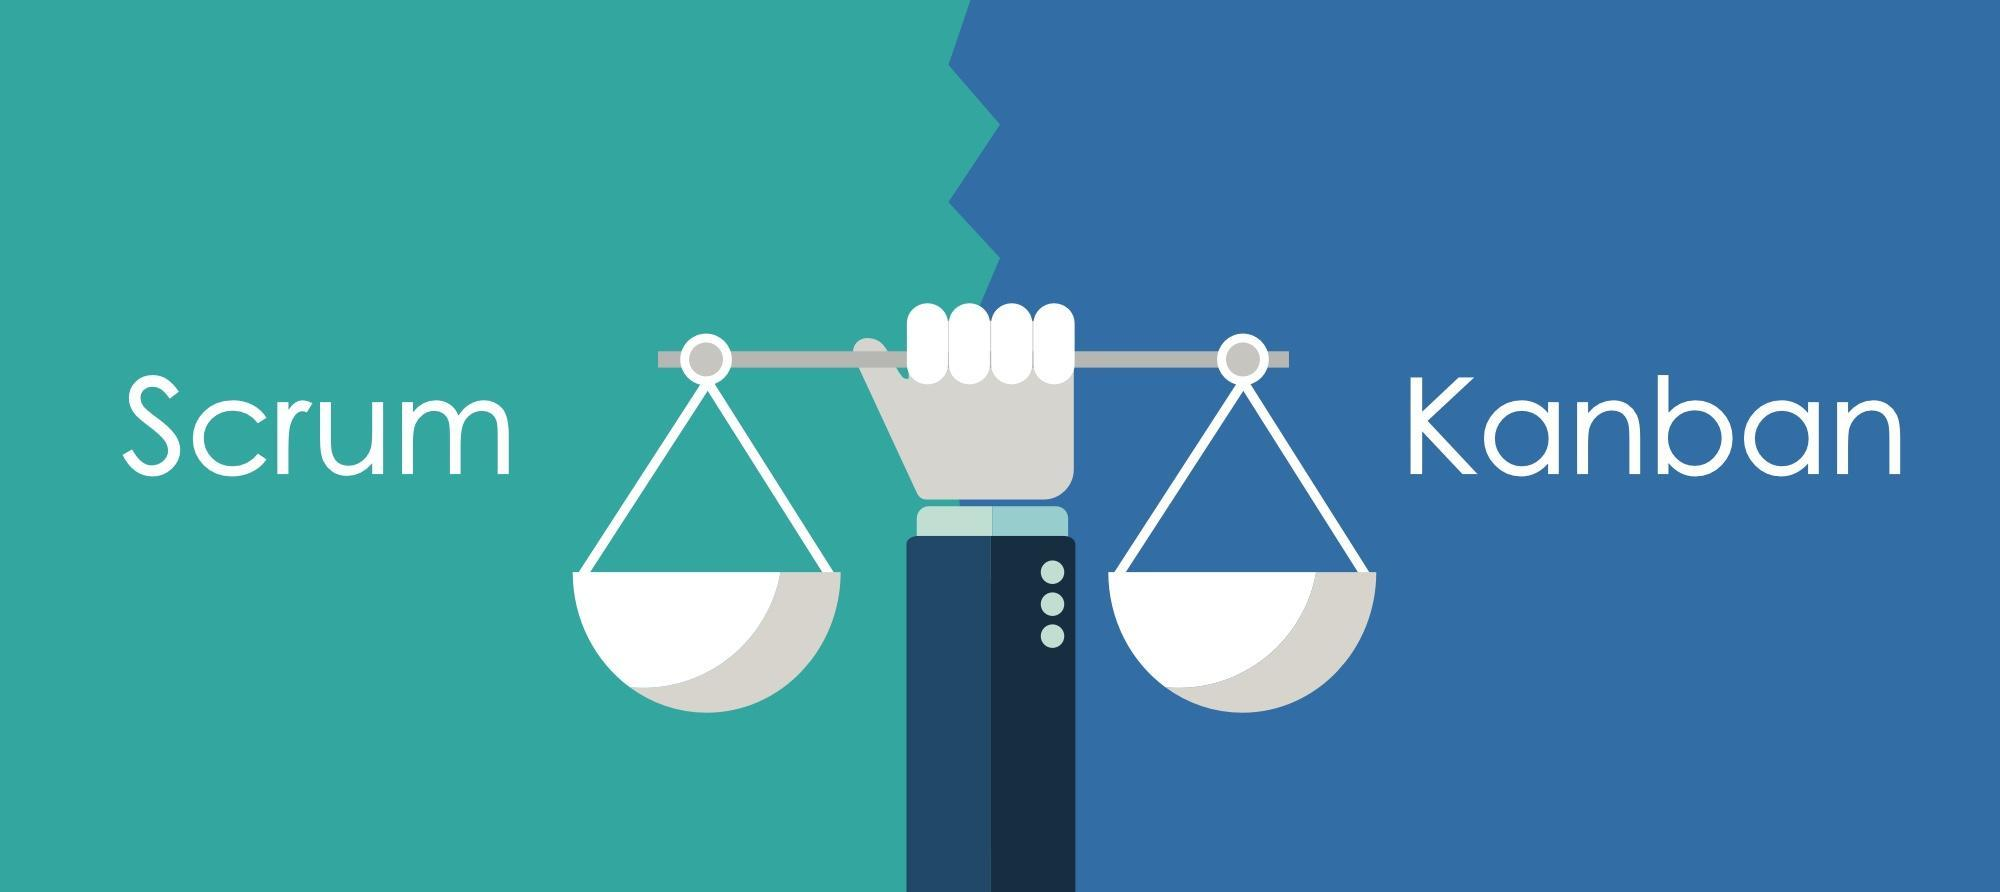 Kanban vs Scrum, Hygger tutorial